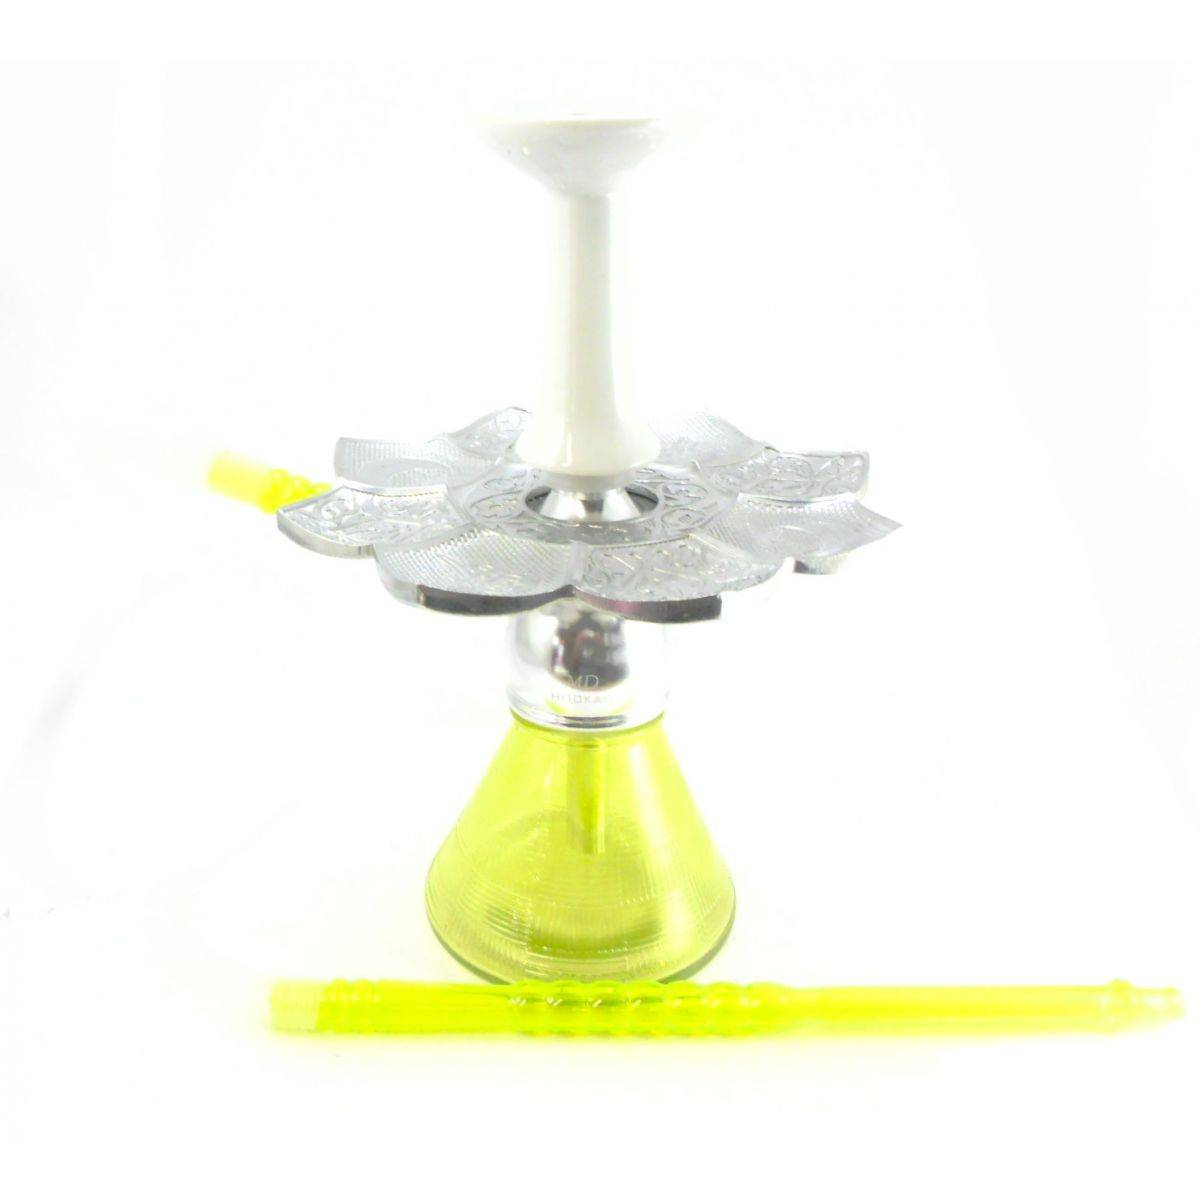 Narguile MD Hookah Bes COMPLETO alumínio 30cm, vaso AMARELO, mangueira MD, fornilho cerâmica funil prato El Nefes Prata